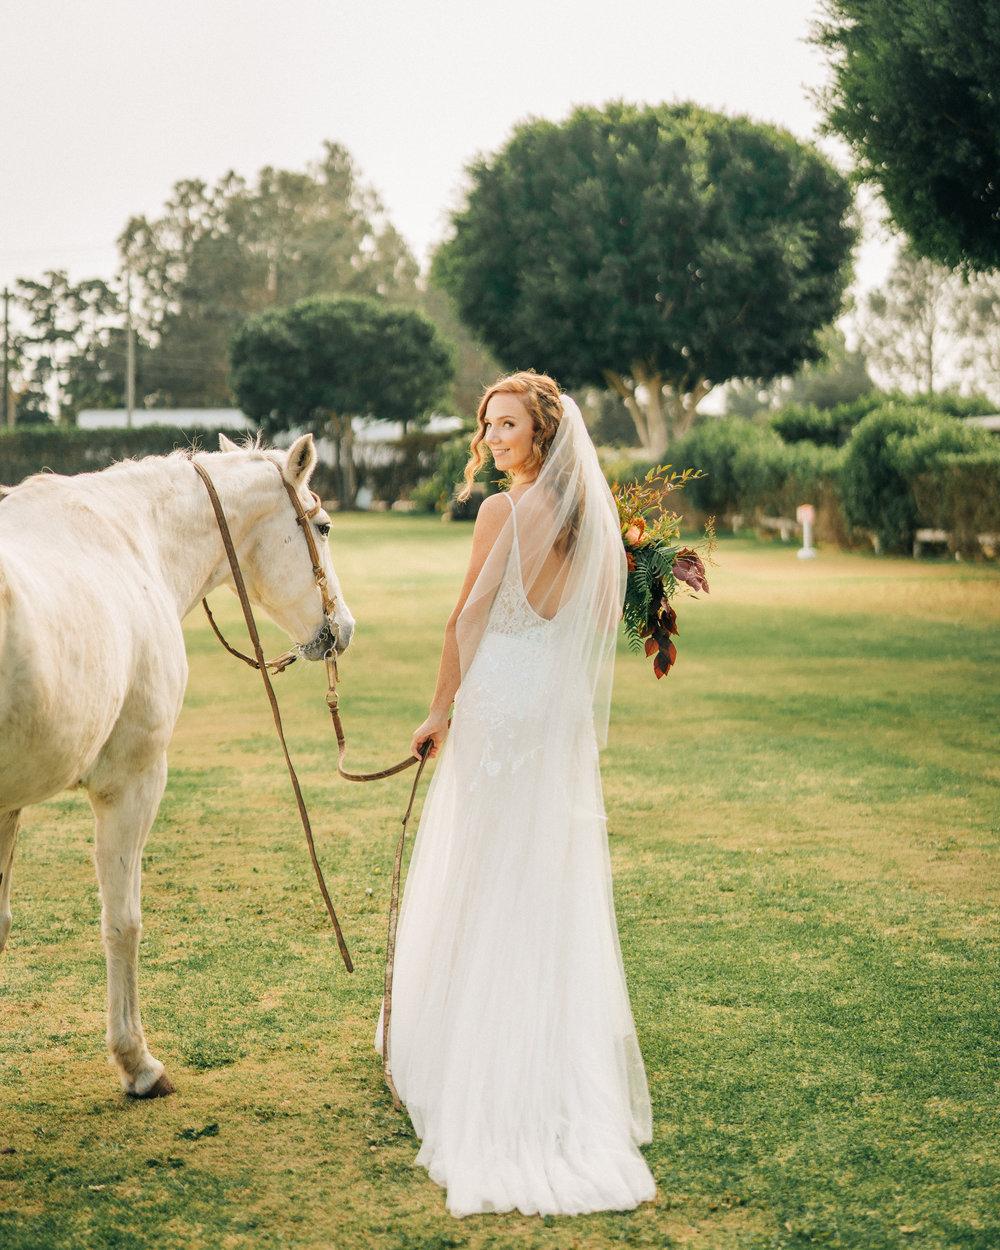 www.santabarbarawedding.com | Brandon Bibbins Photography | The Cottages at Polo Run | Lucy Salgado | Bride Leads Horse